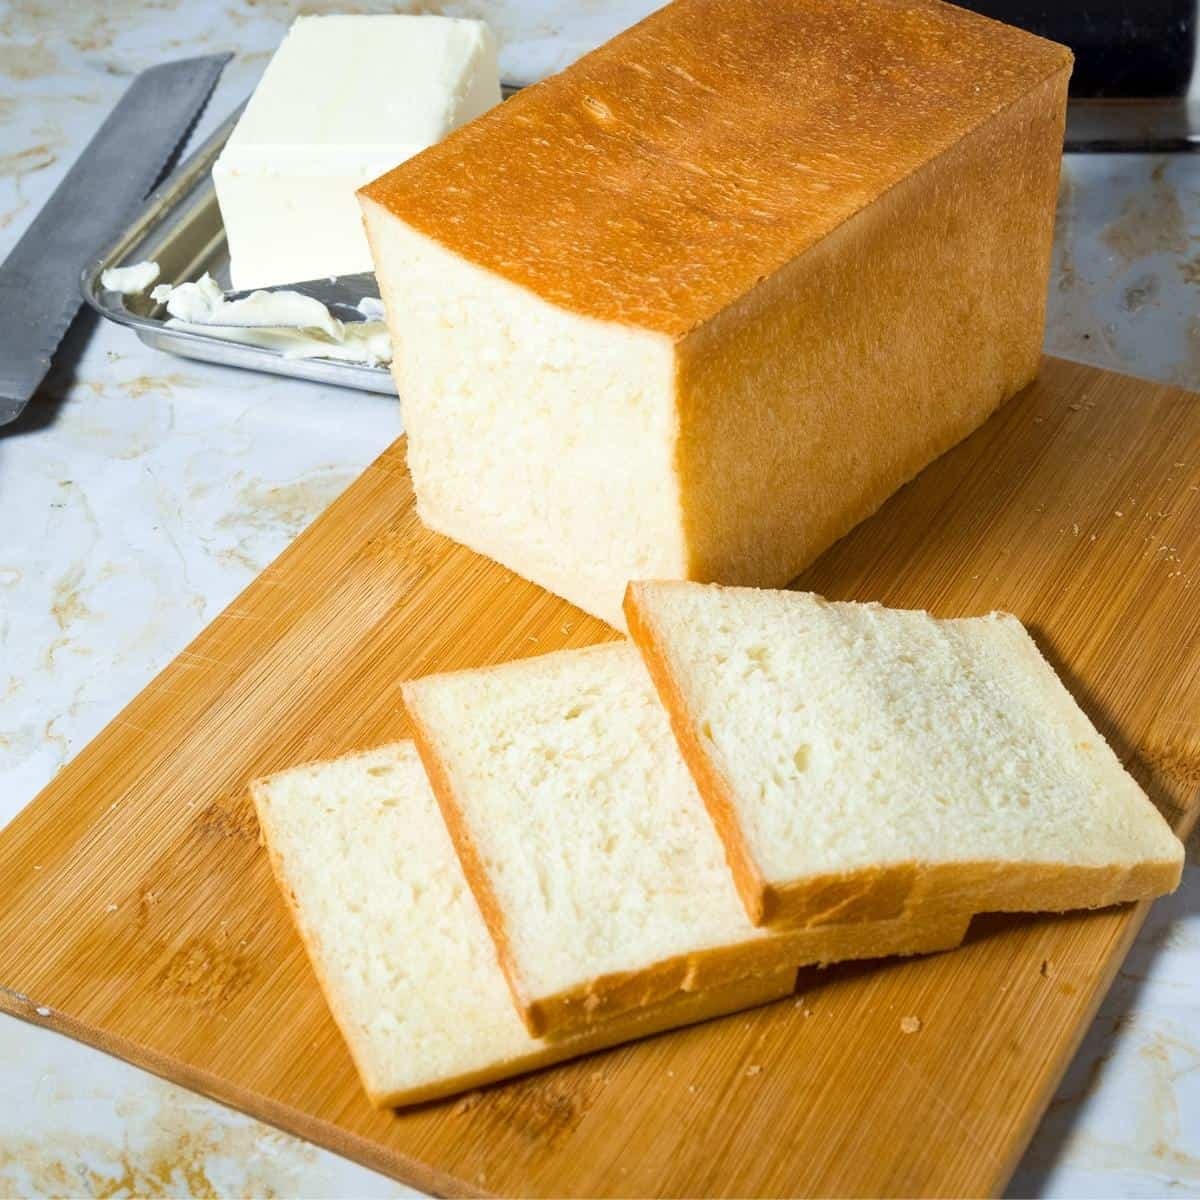 Sliced pullman bread on a wooden board